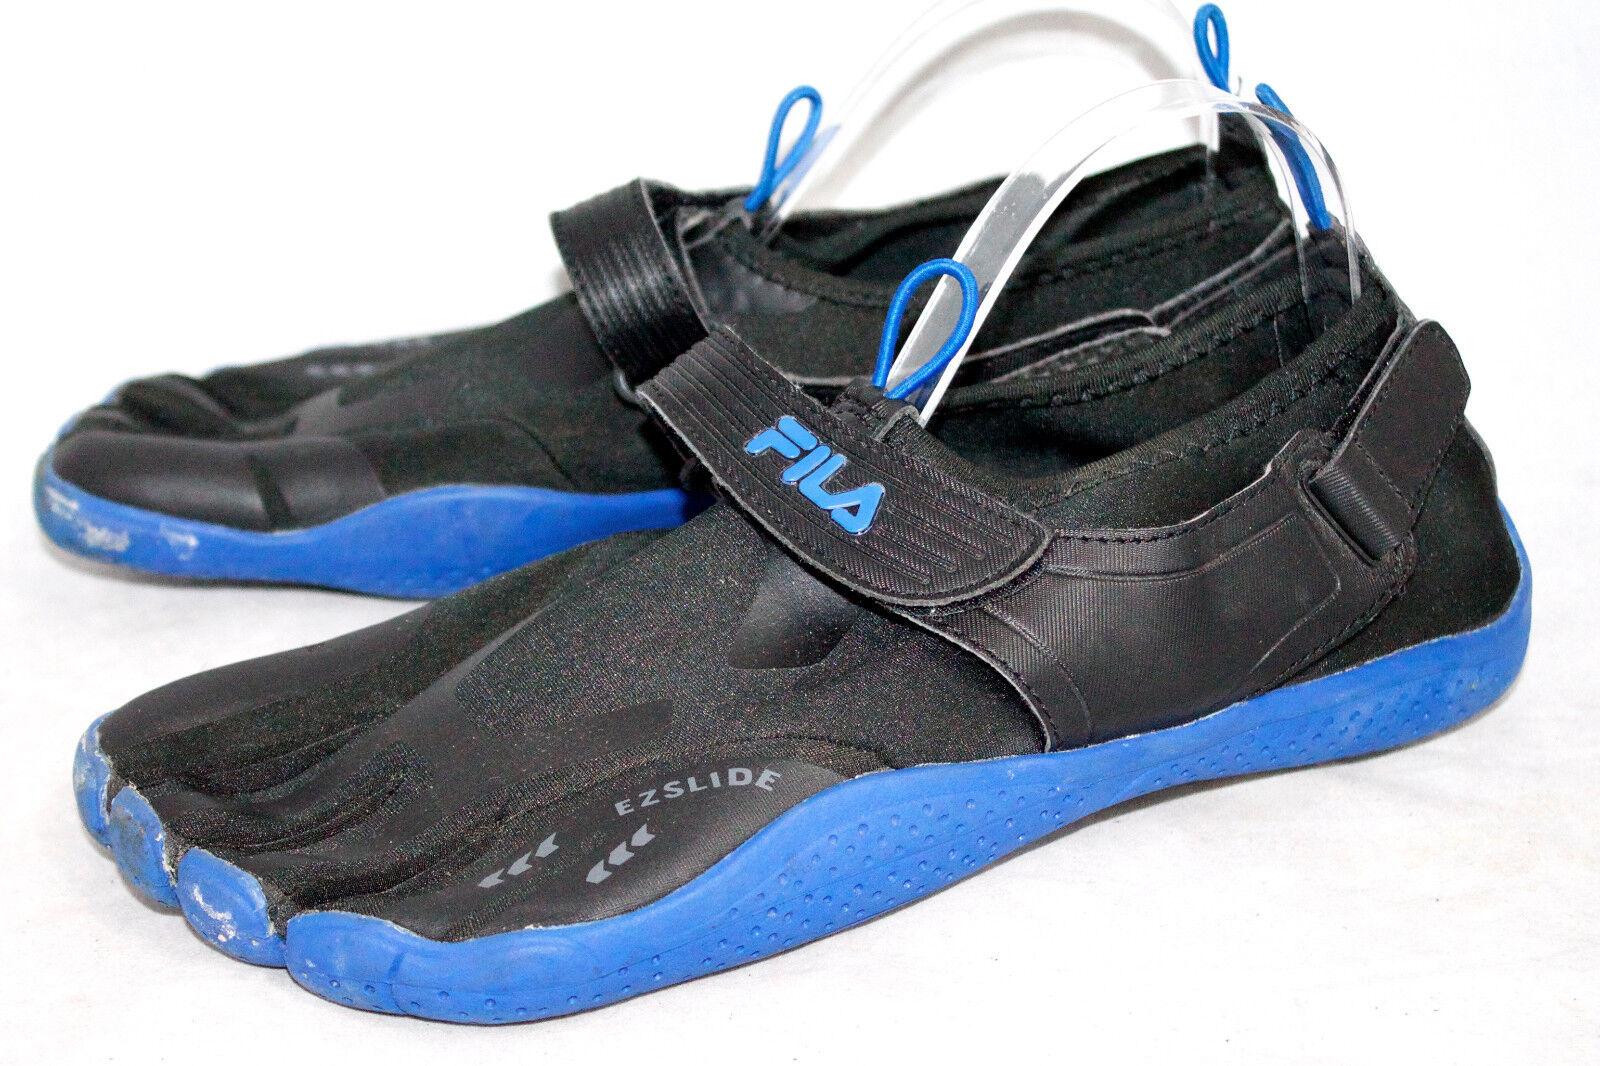 FILA EZ Slide Skele-Toes Men's 11 Black Blue 1PK000EX-003 Barefoot Athletic Shoe Wild casual shoes